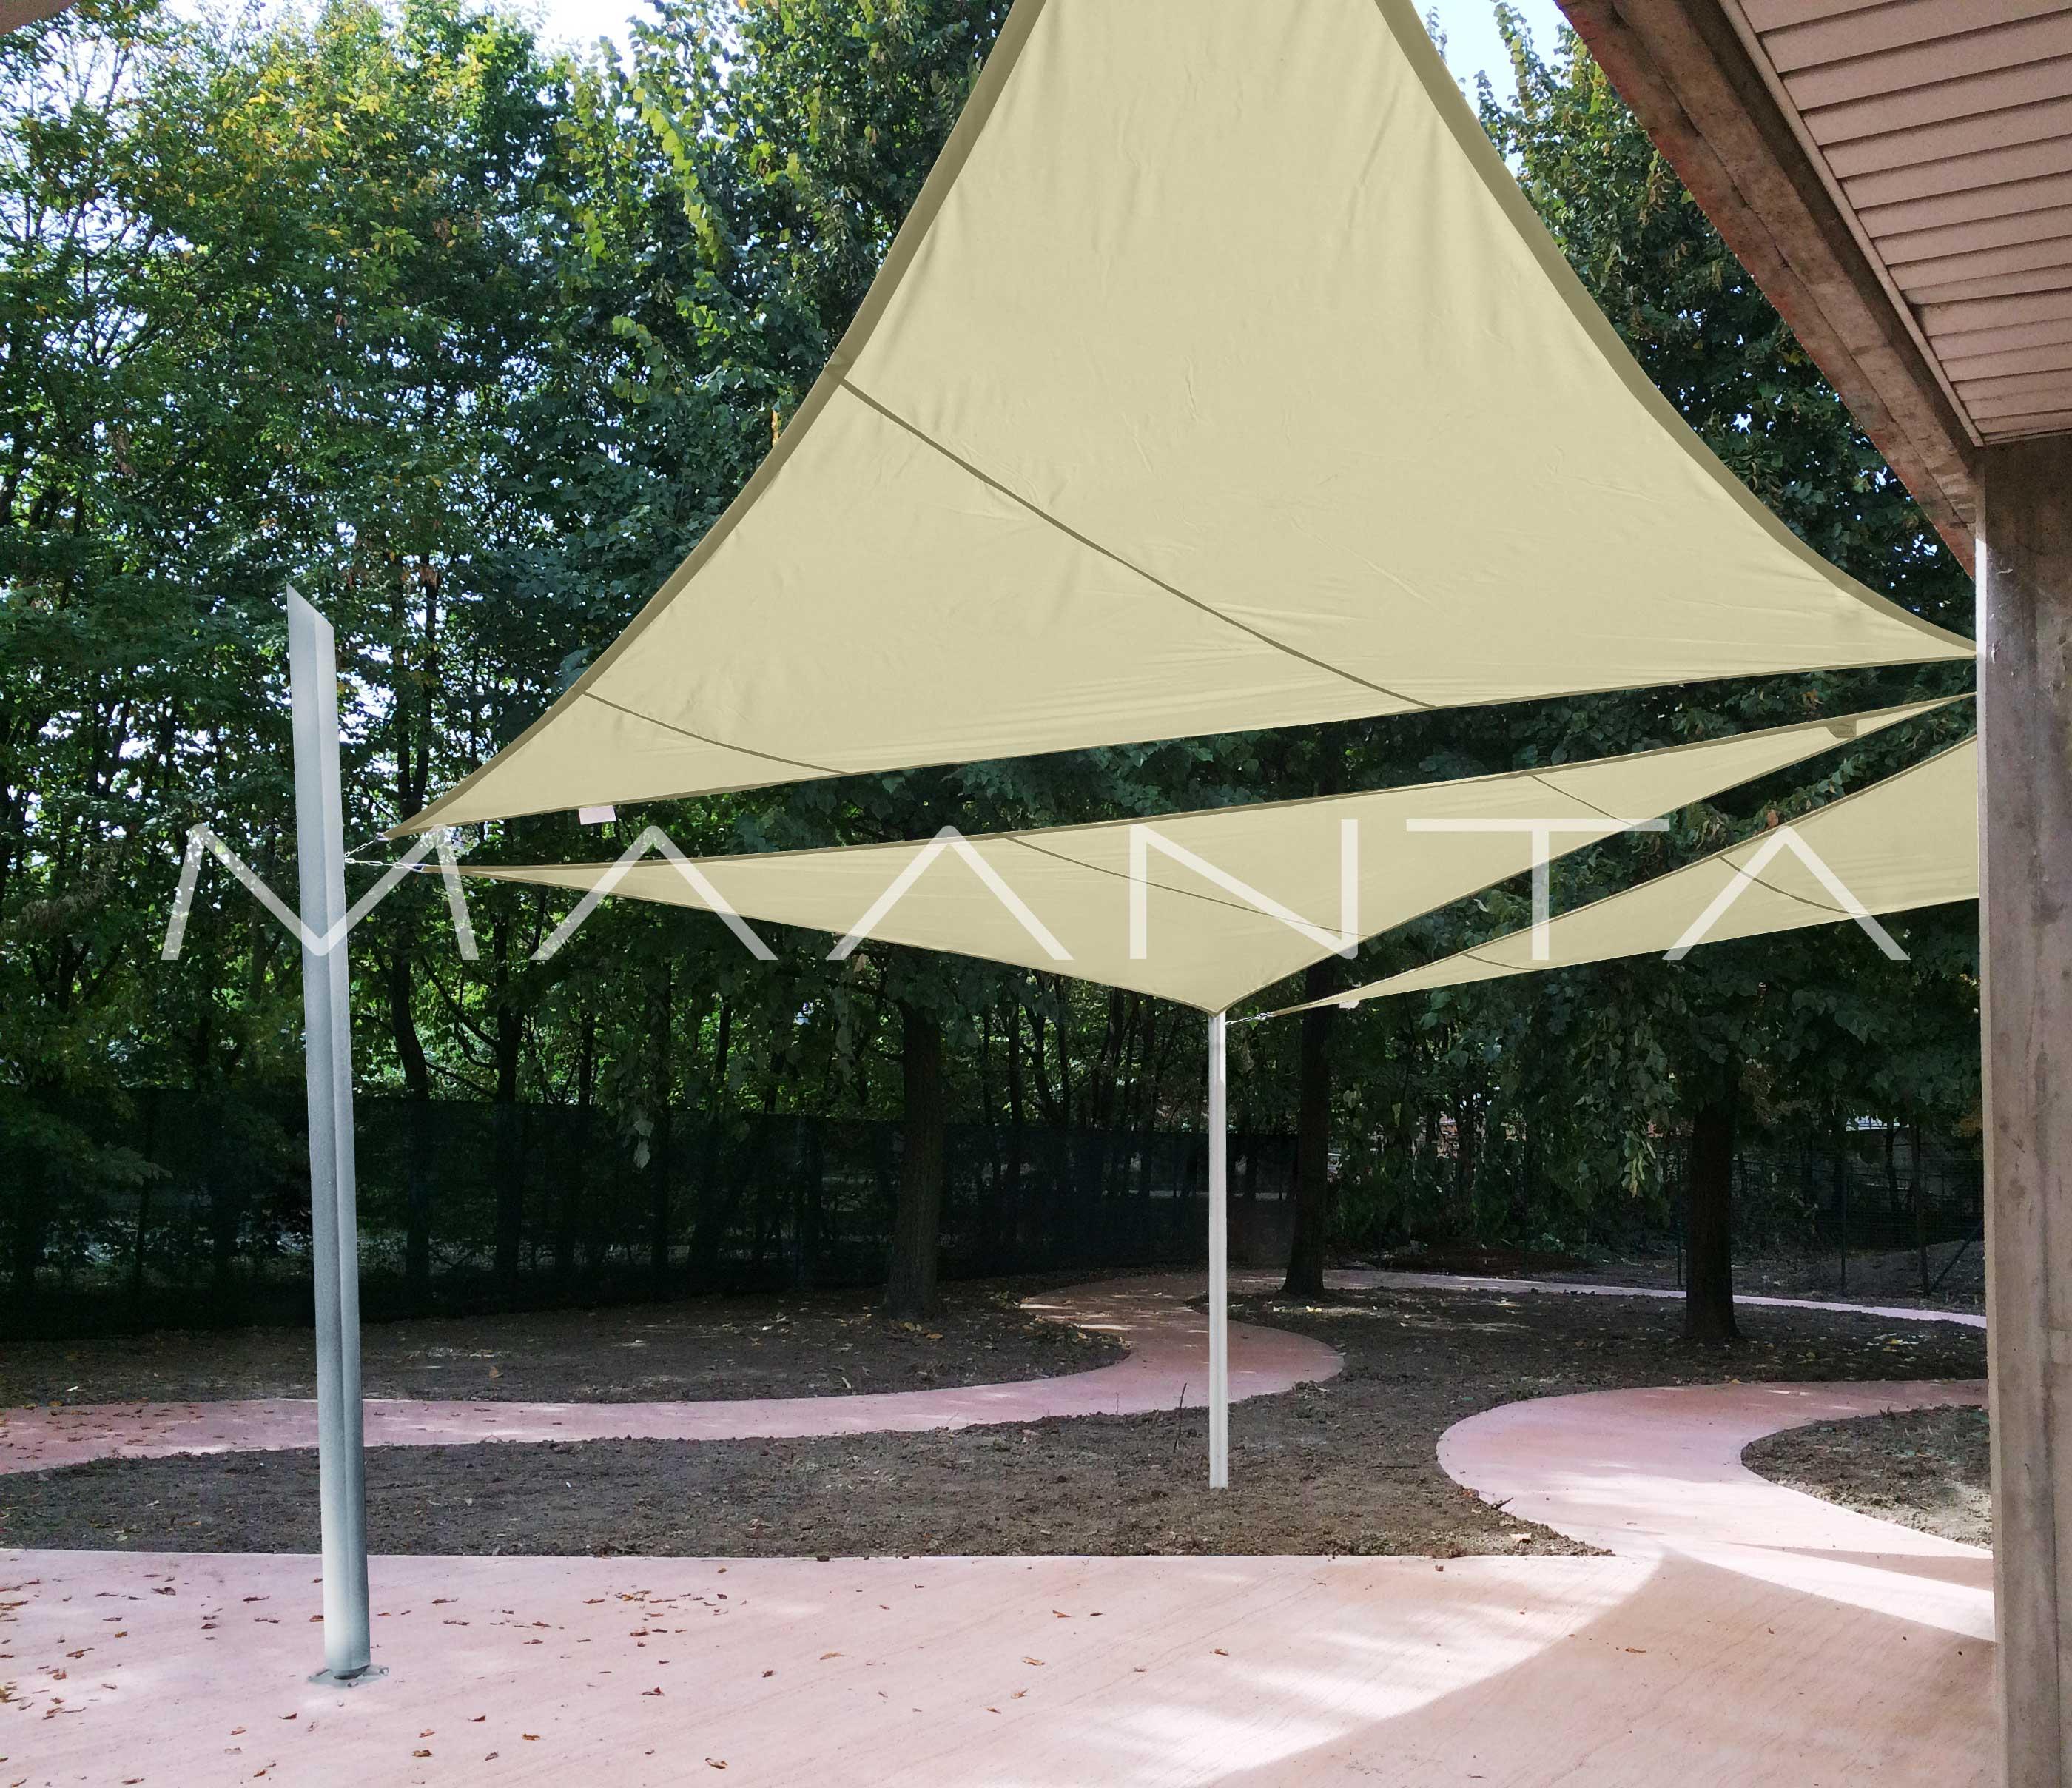 Tende Triangolari Da Esterno.Tende A Vela Impermeabili